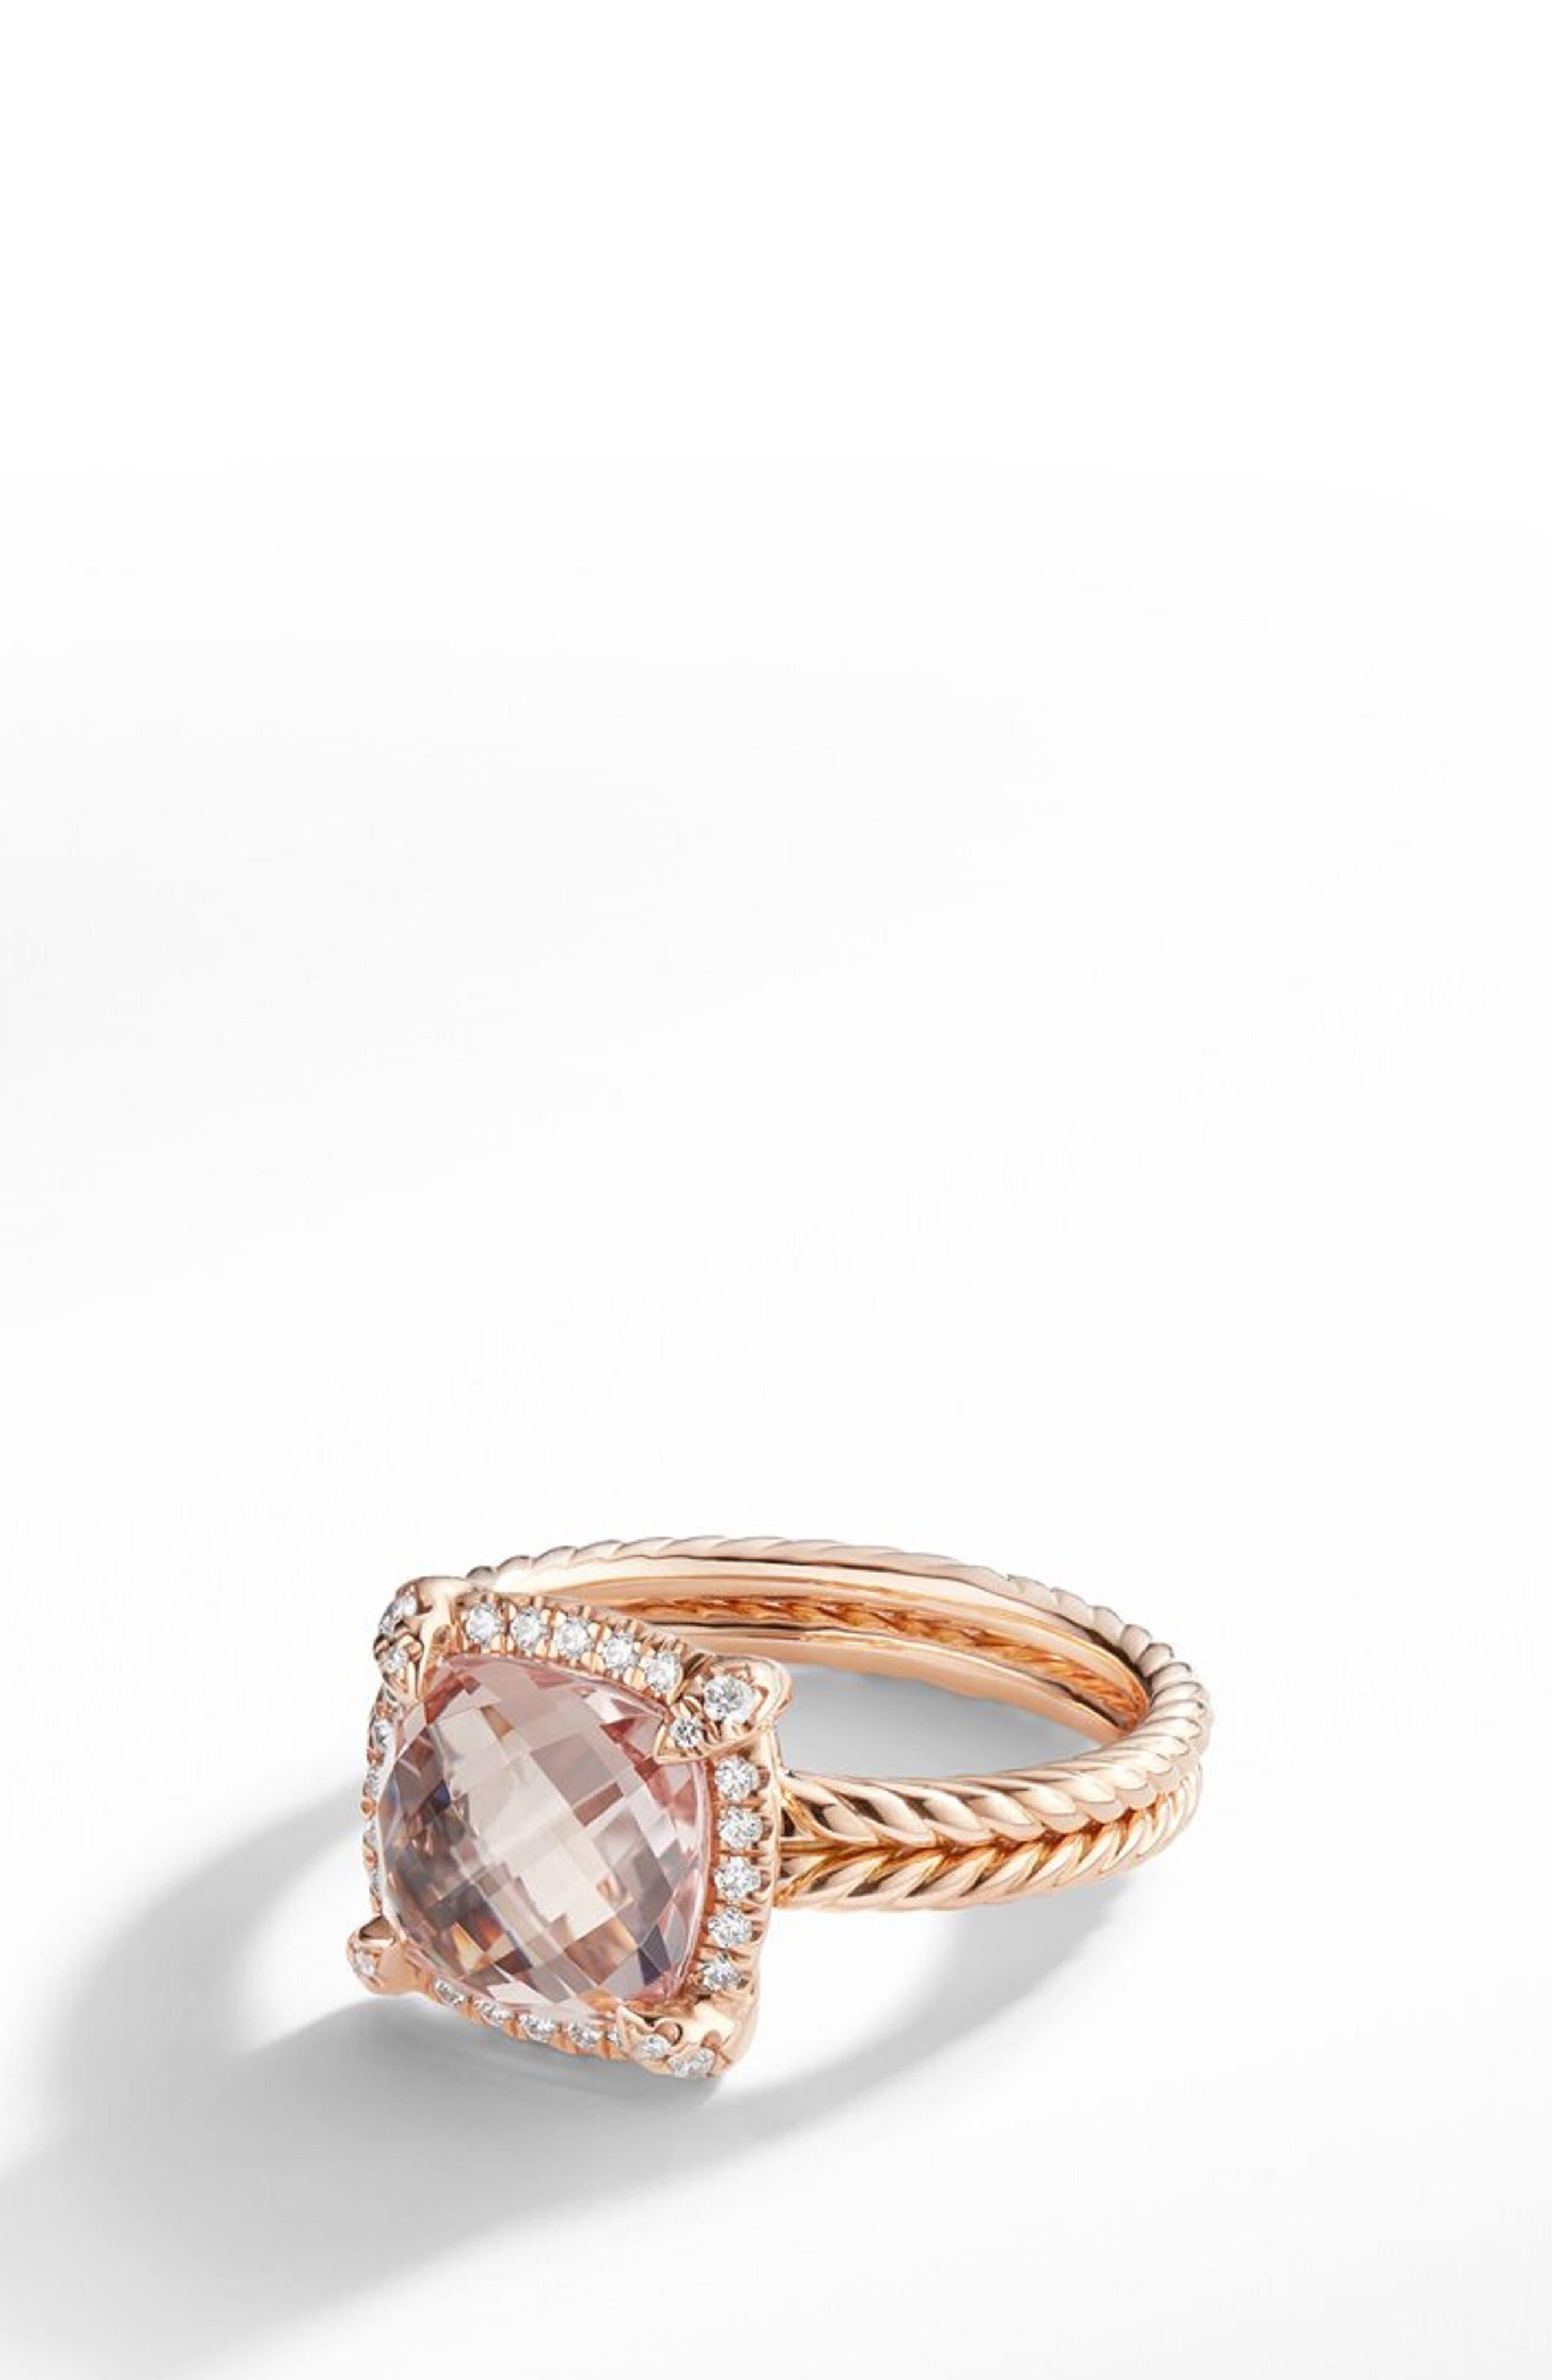 Chatelaine<sup>®</sup> Pavé Bezel Ring in 18K Rose Gold,                         Main,                         color, ROSE GOLD/ DIAMOND/ MORGANITE